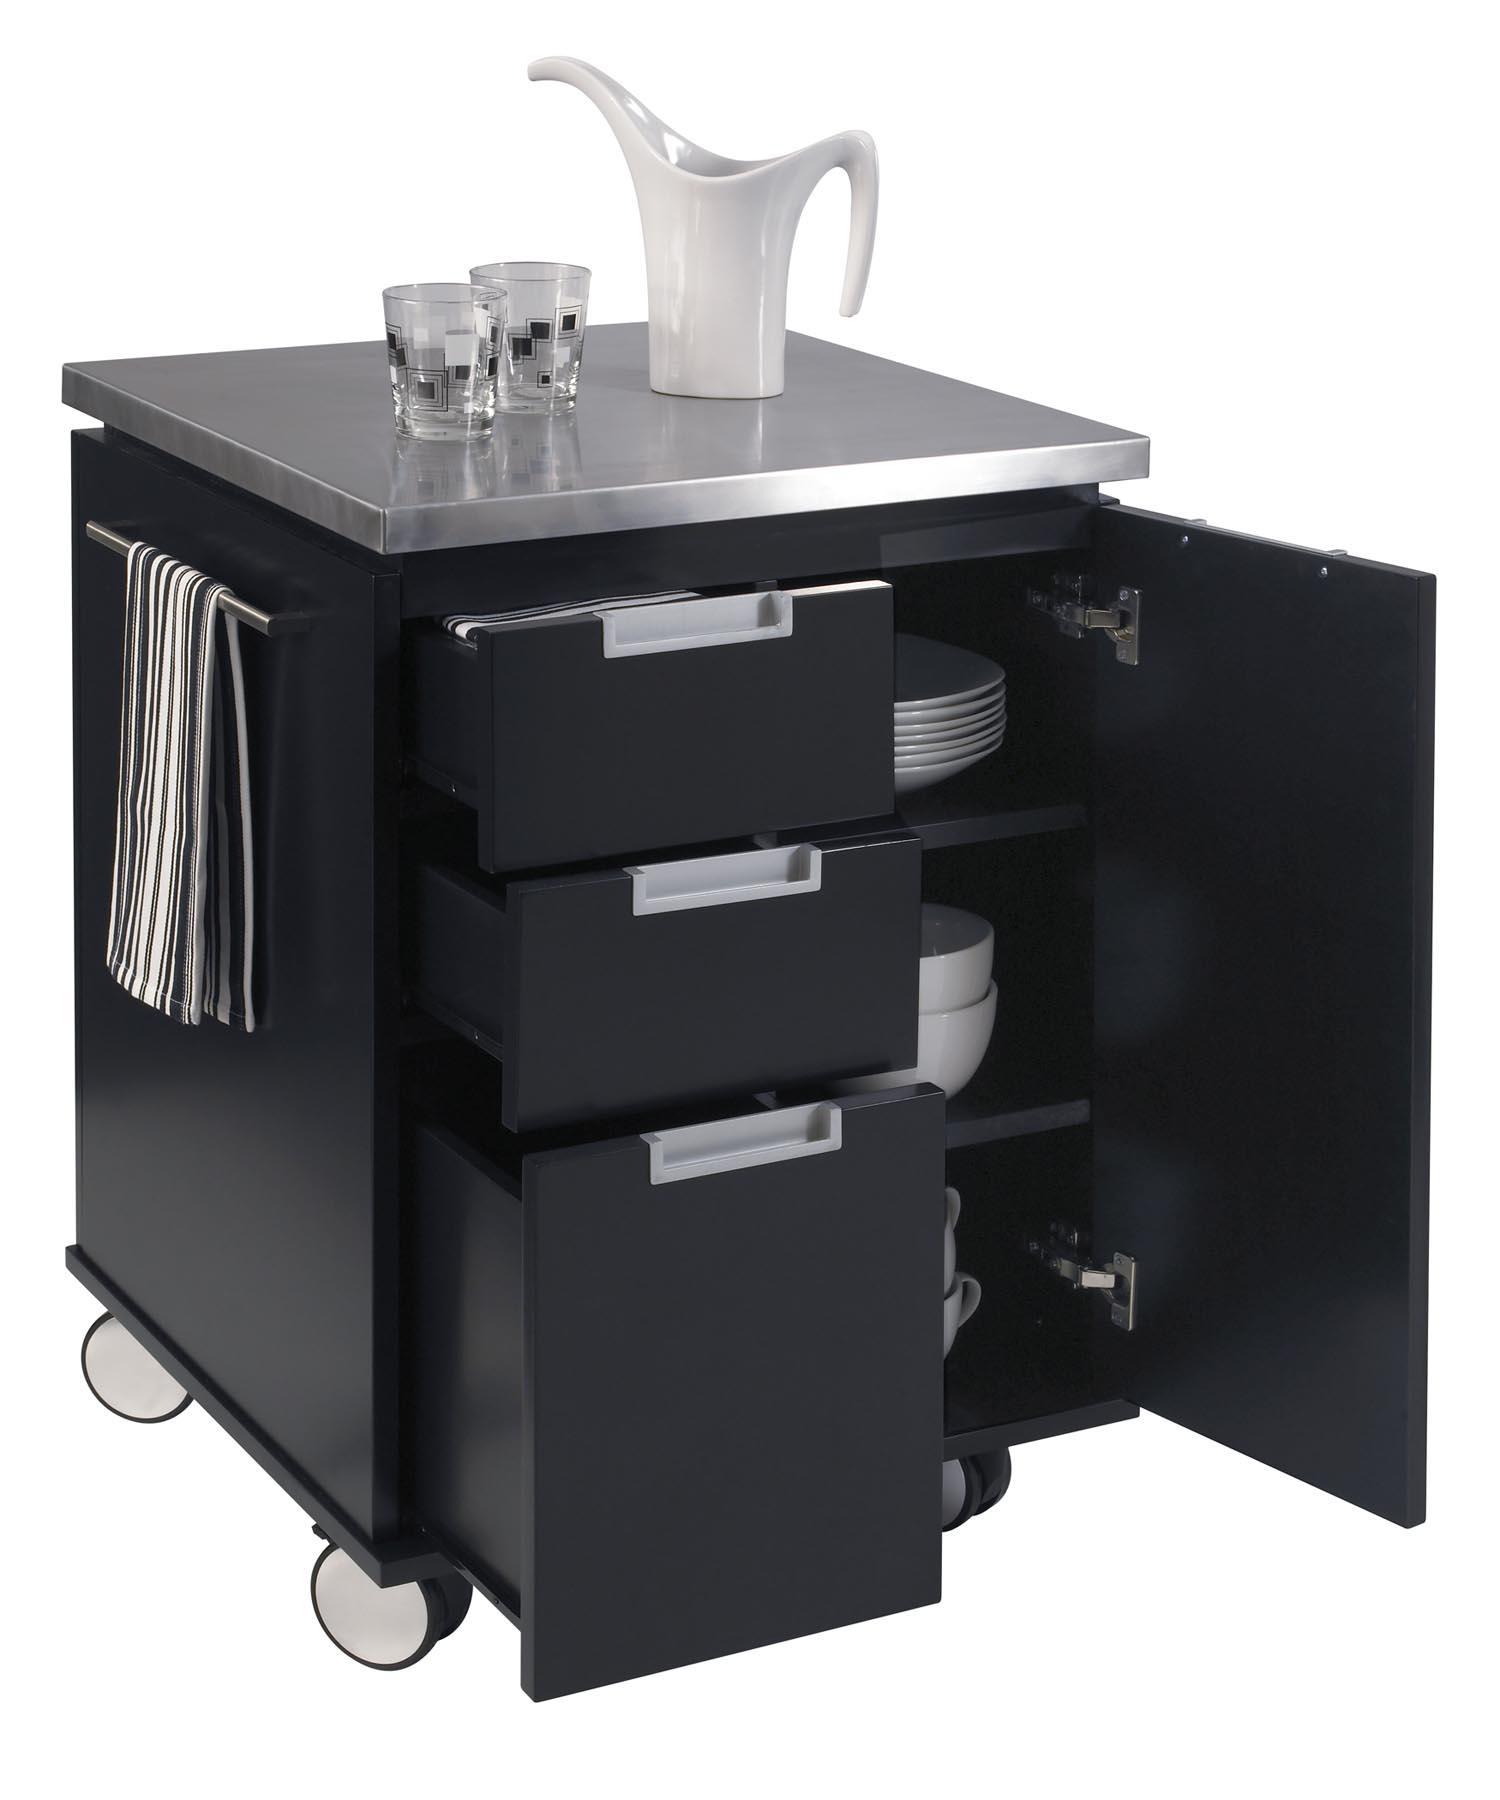 home styles kitchen cart sink mounting hardware carts modern storage with cartsmodern